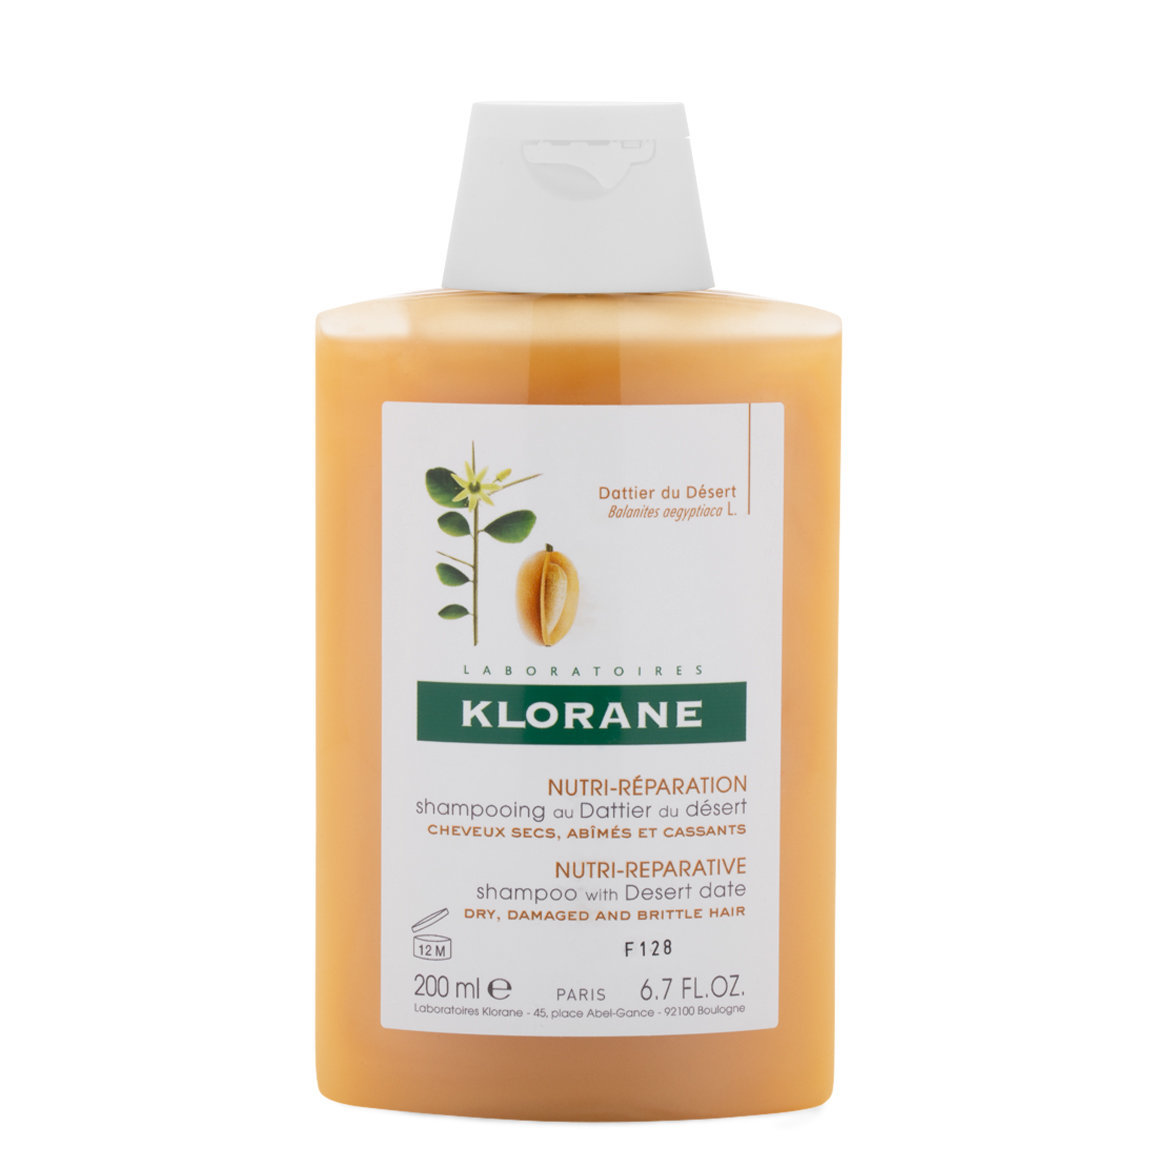 Klorane Shampoo with Desert Date 6.7 oz alternative view 1 - product swatch.